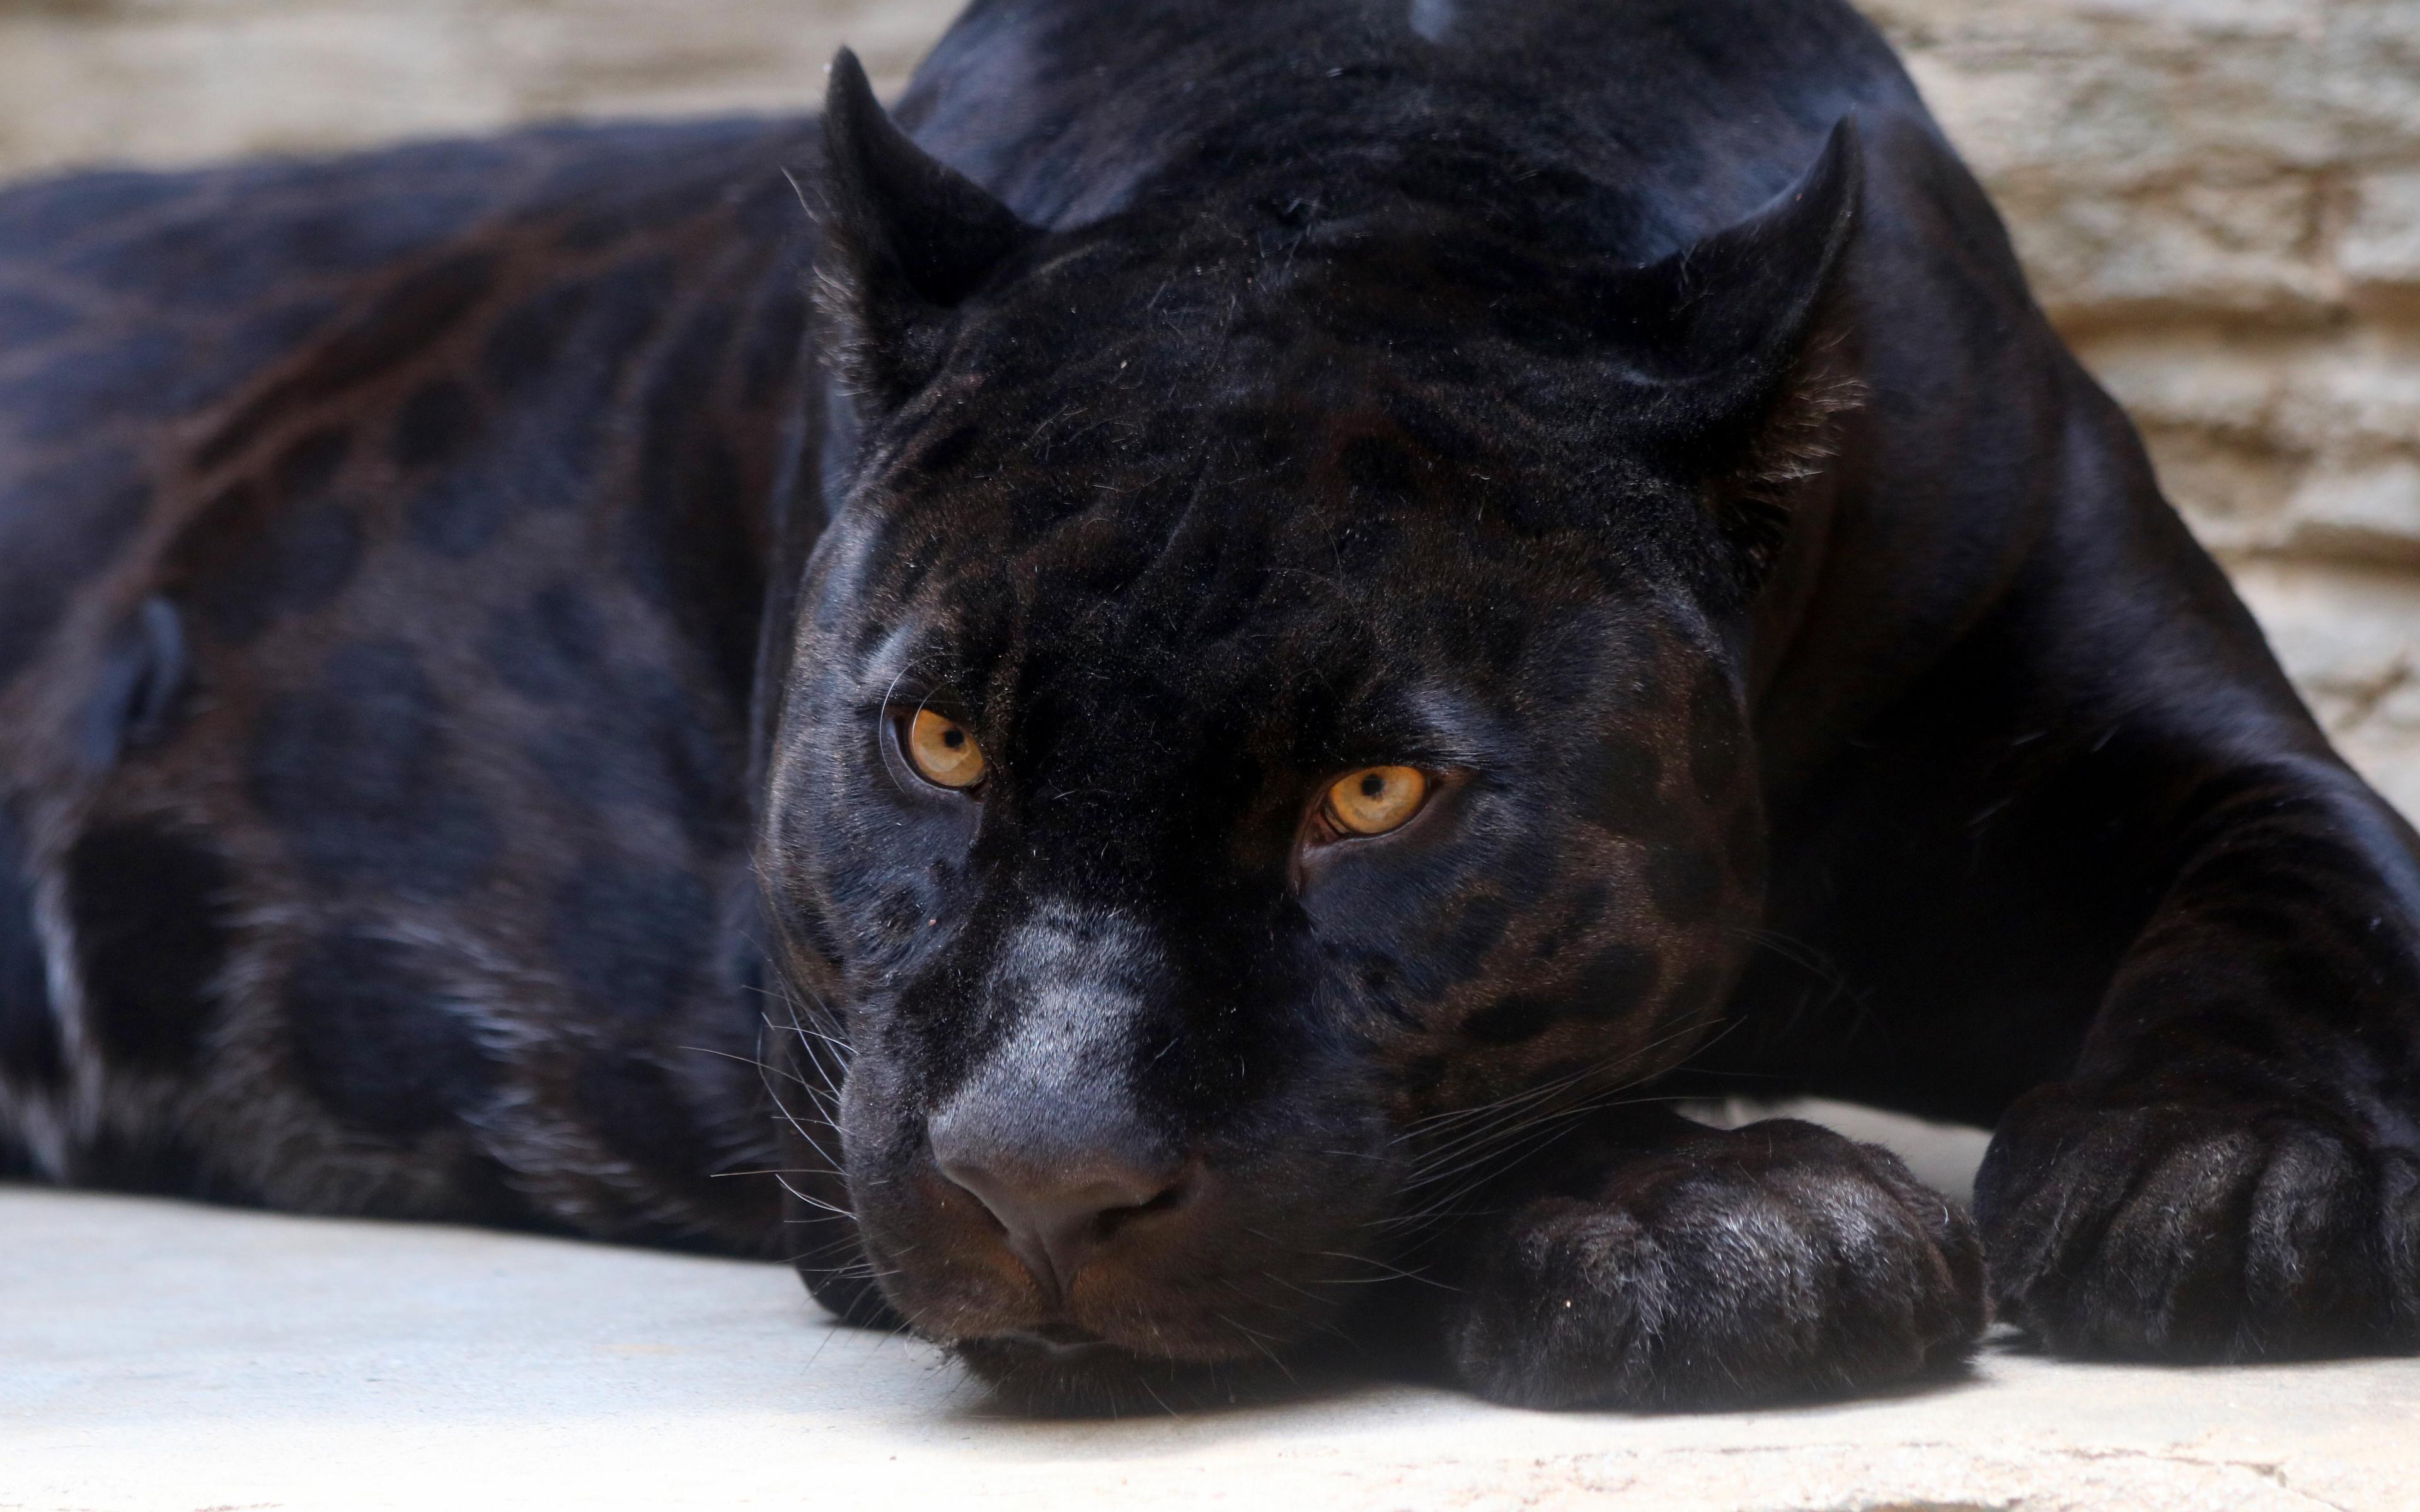 Download 3840x2400 Wallpaper Black Panther Predator Relaxed 4k